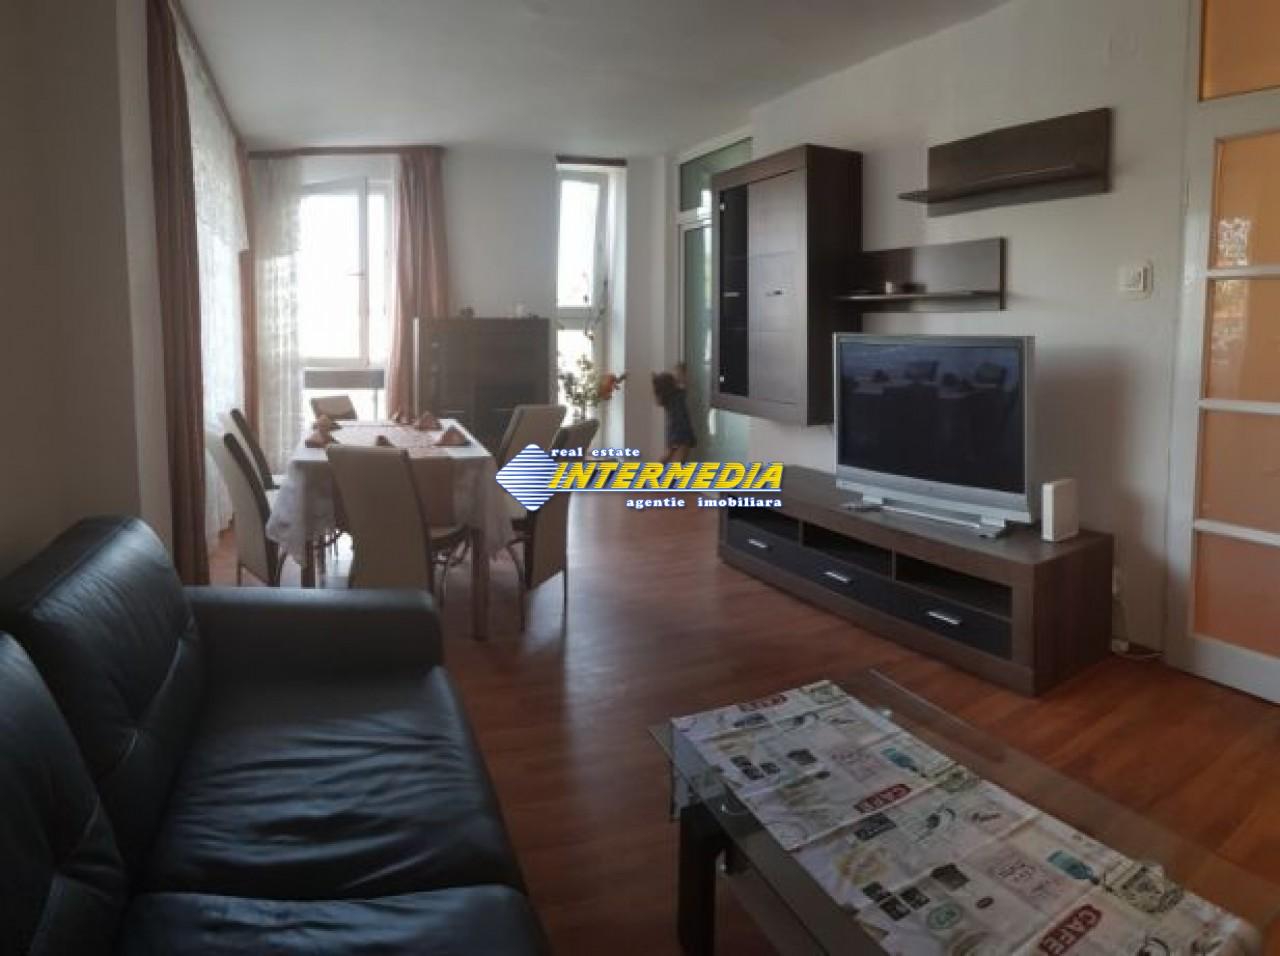 204227329_5_644x461_apartament-centru-alba_rev003.jpg